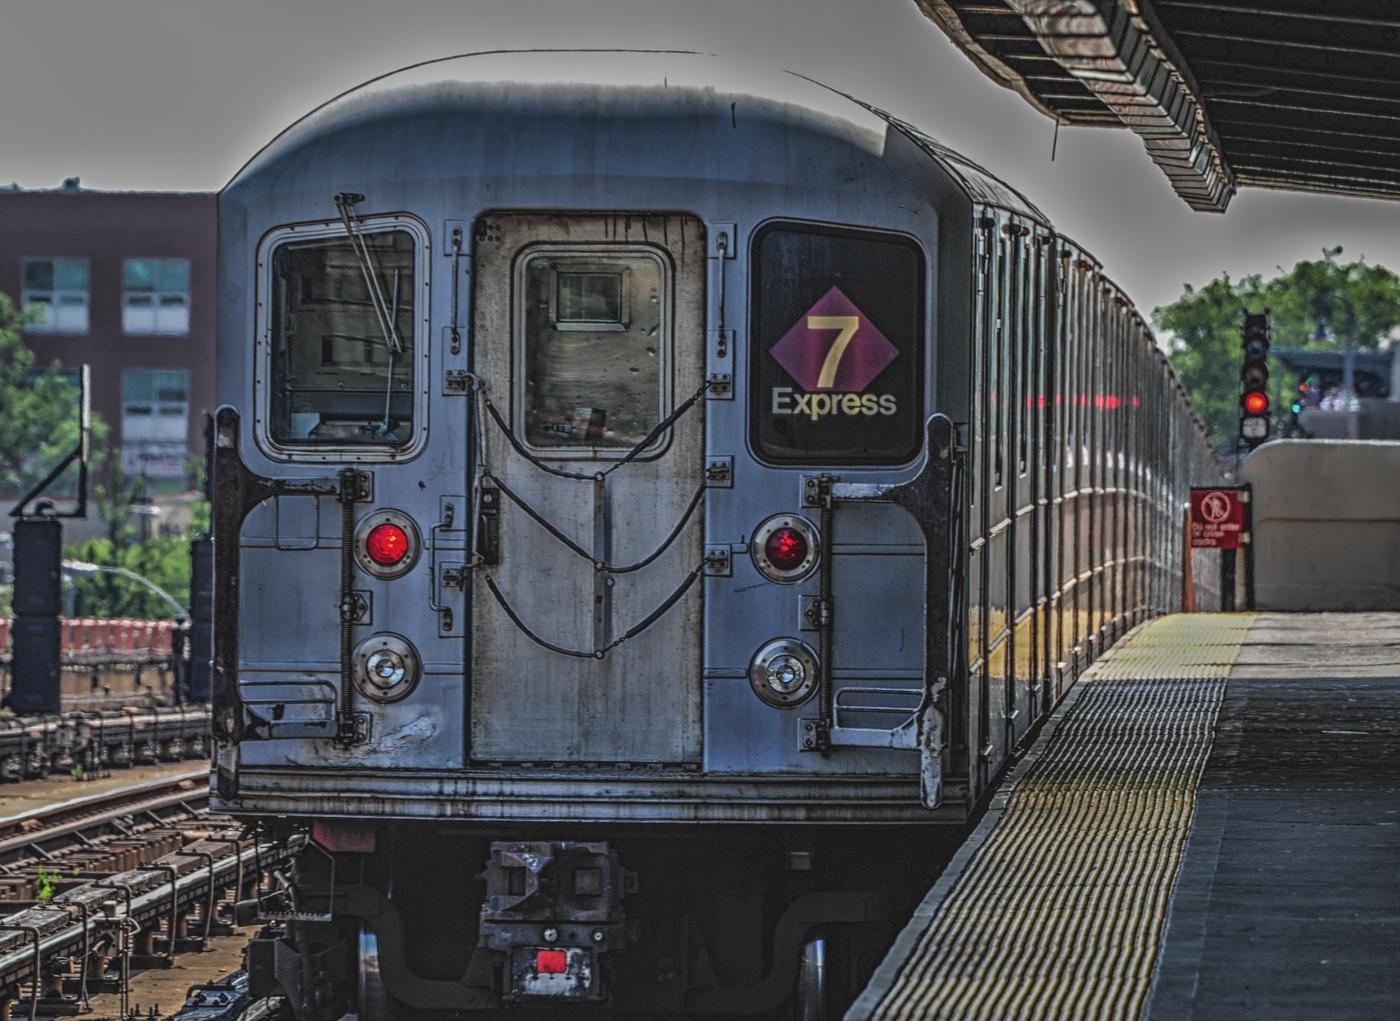 7 Train Express